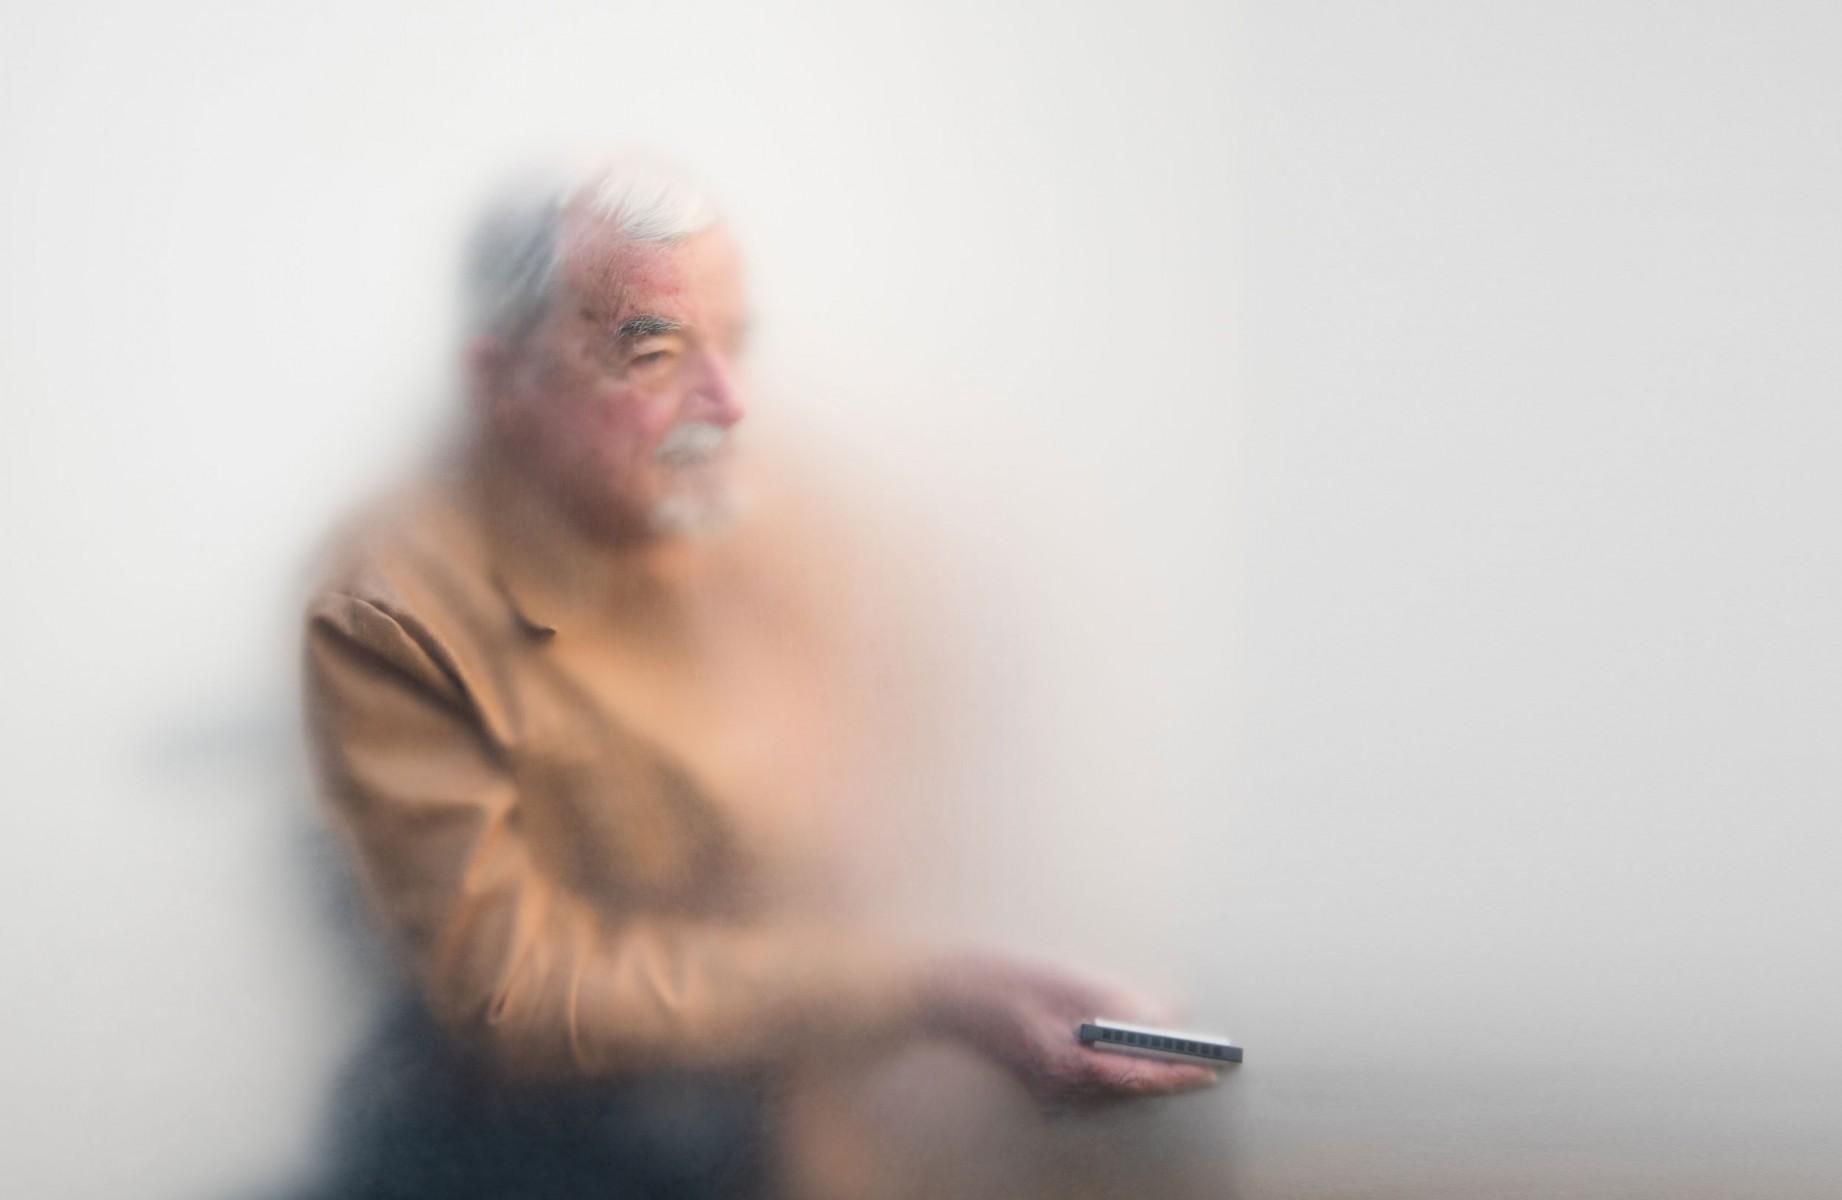 An older man in a wheelchair